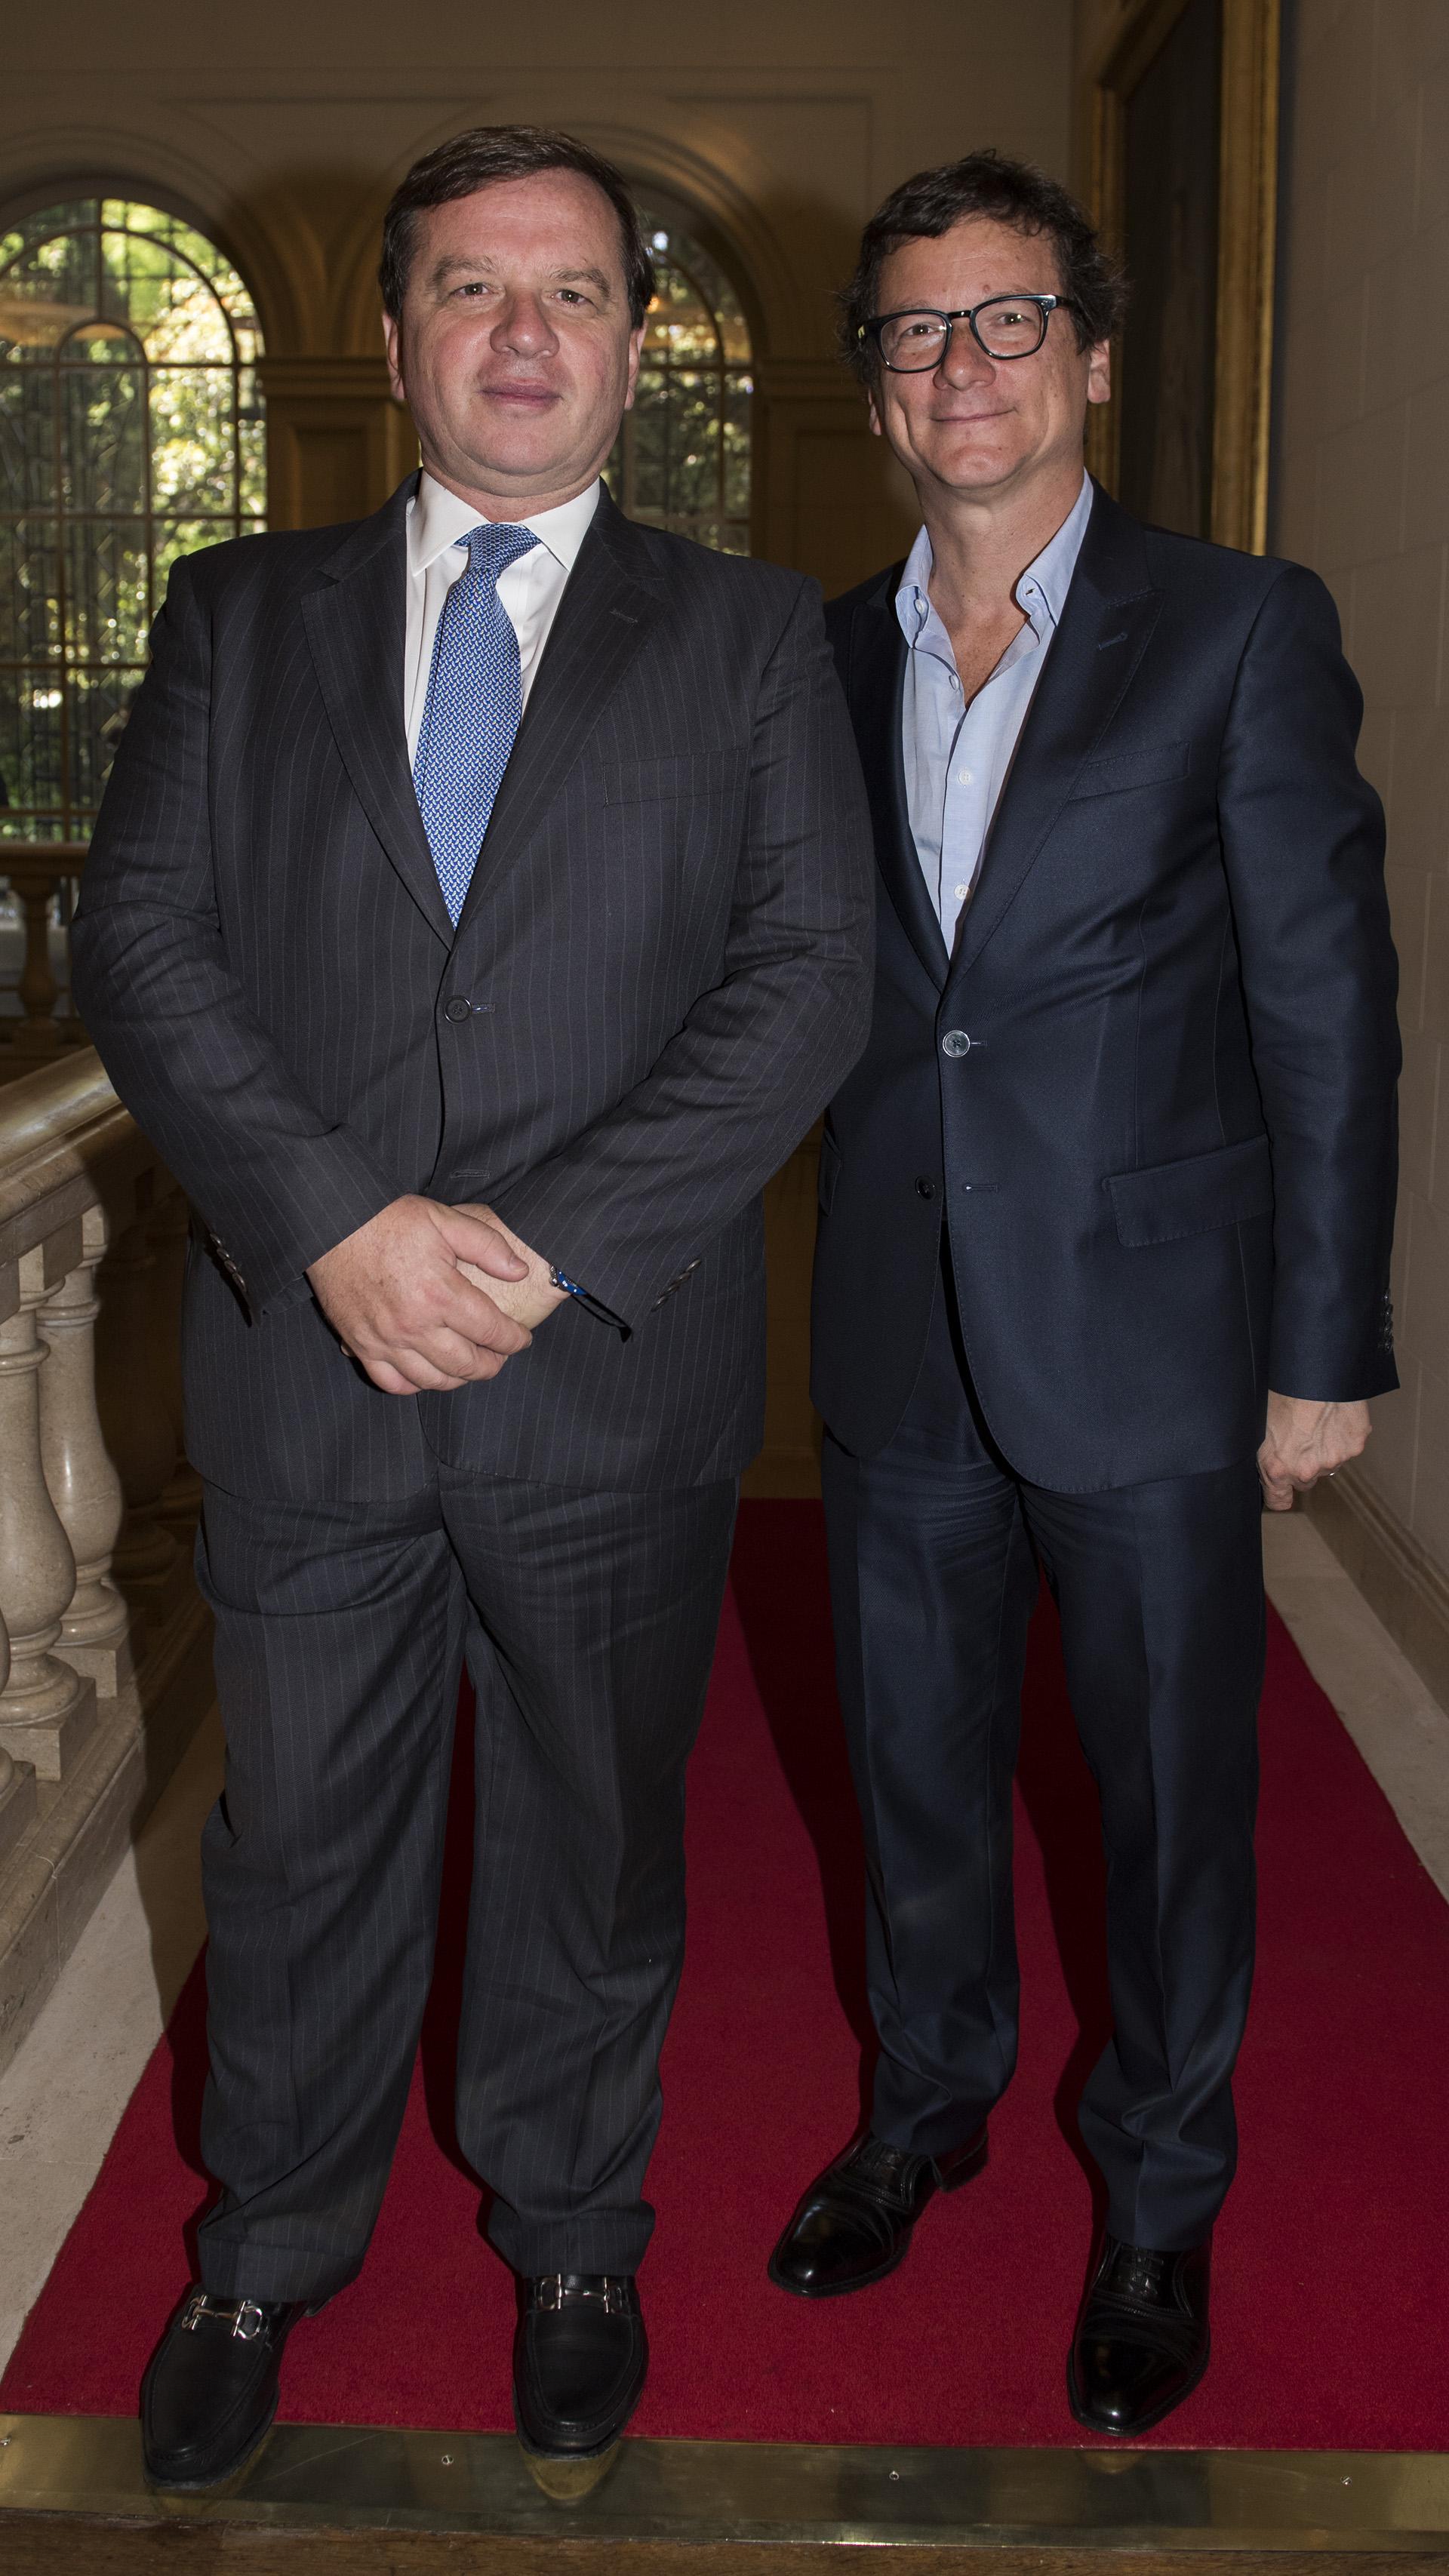 Gerardo Mato, chairman – Global Banking and Markets – Americas de HSBC, y Gabriel Martino, presidente de HSBC Argentina